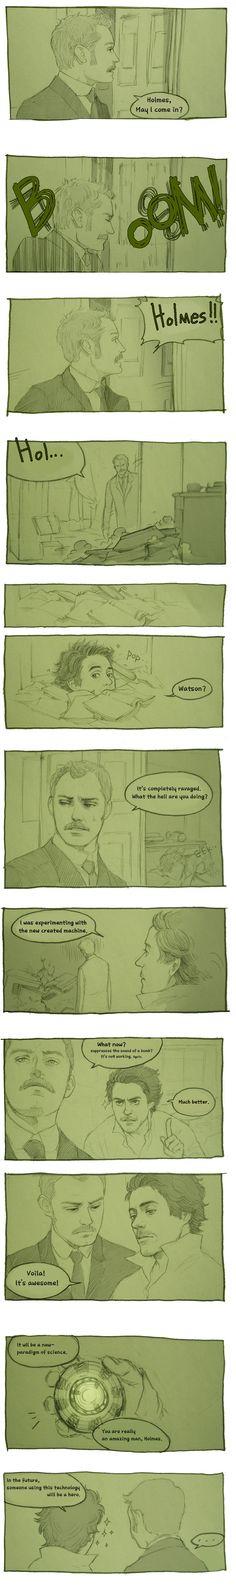 http://hallpen.deviantart.com/  Holmes n Watson by Hallpen